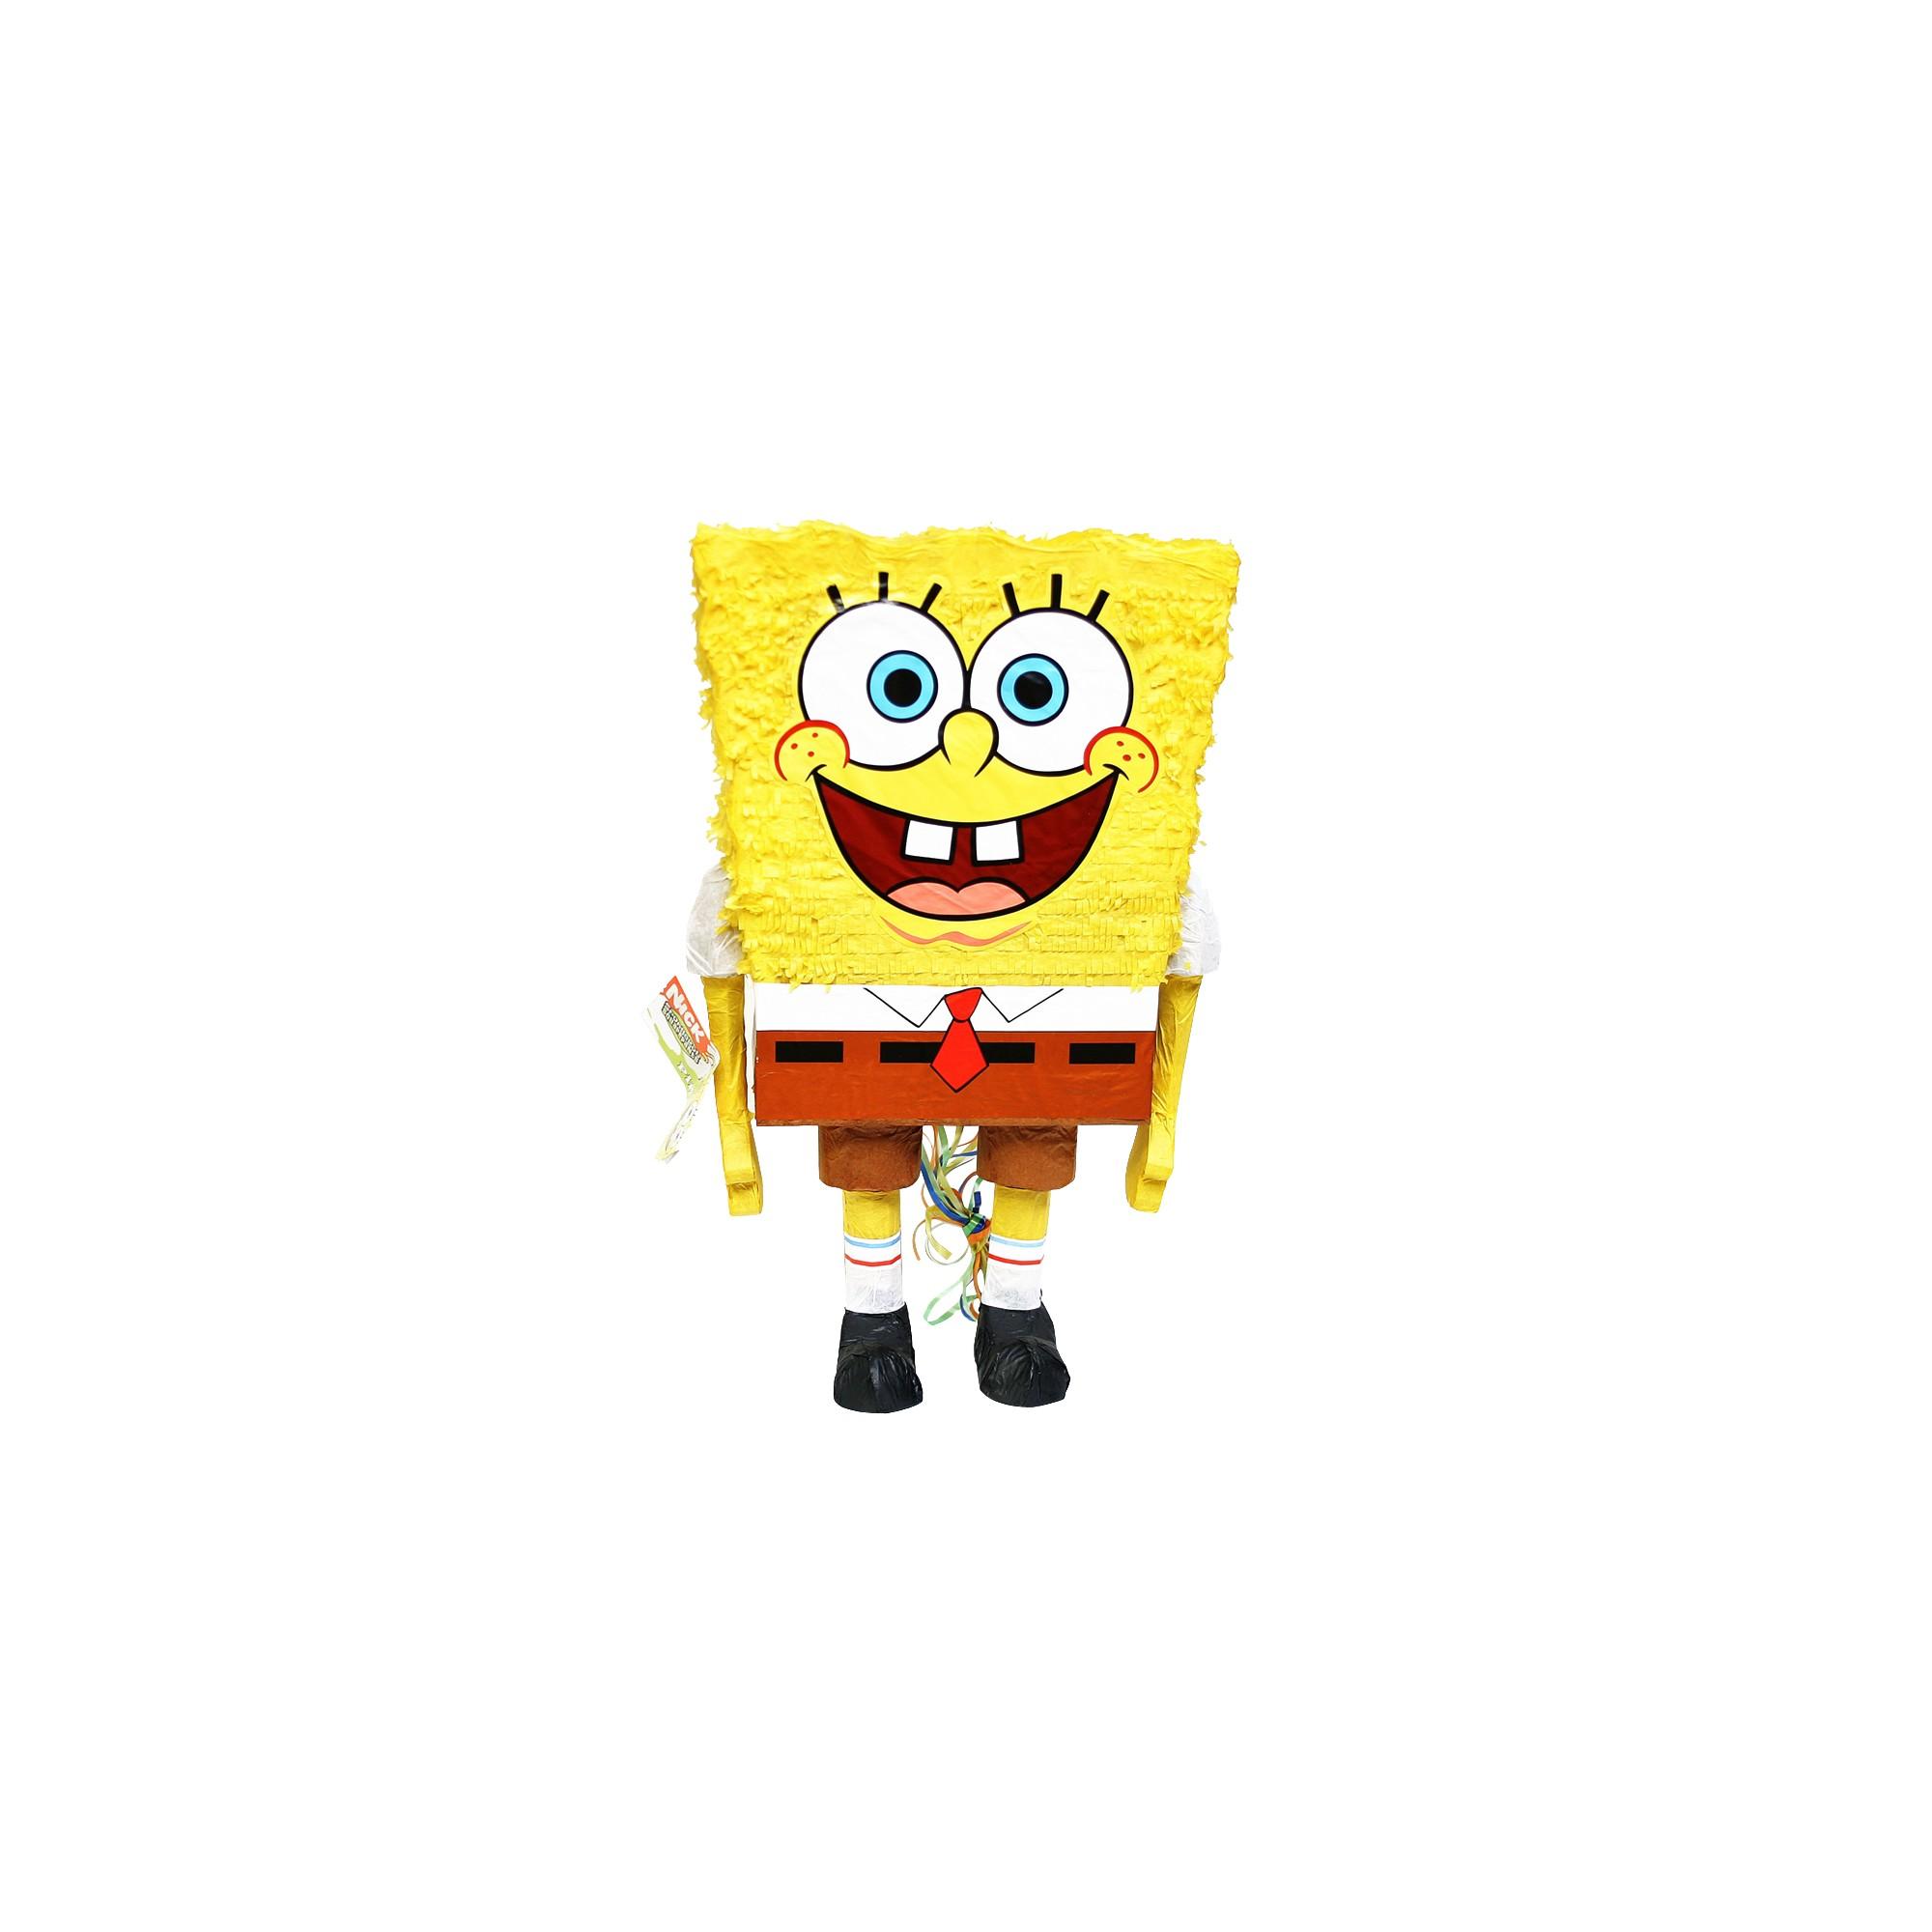 SpongeBob Squarepants Pinata | Spongebob squarepants and Products